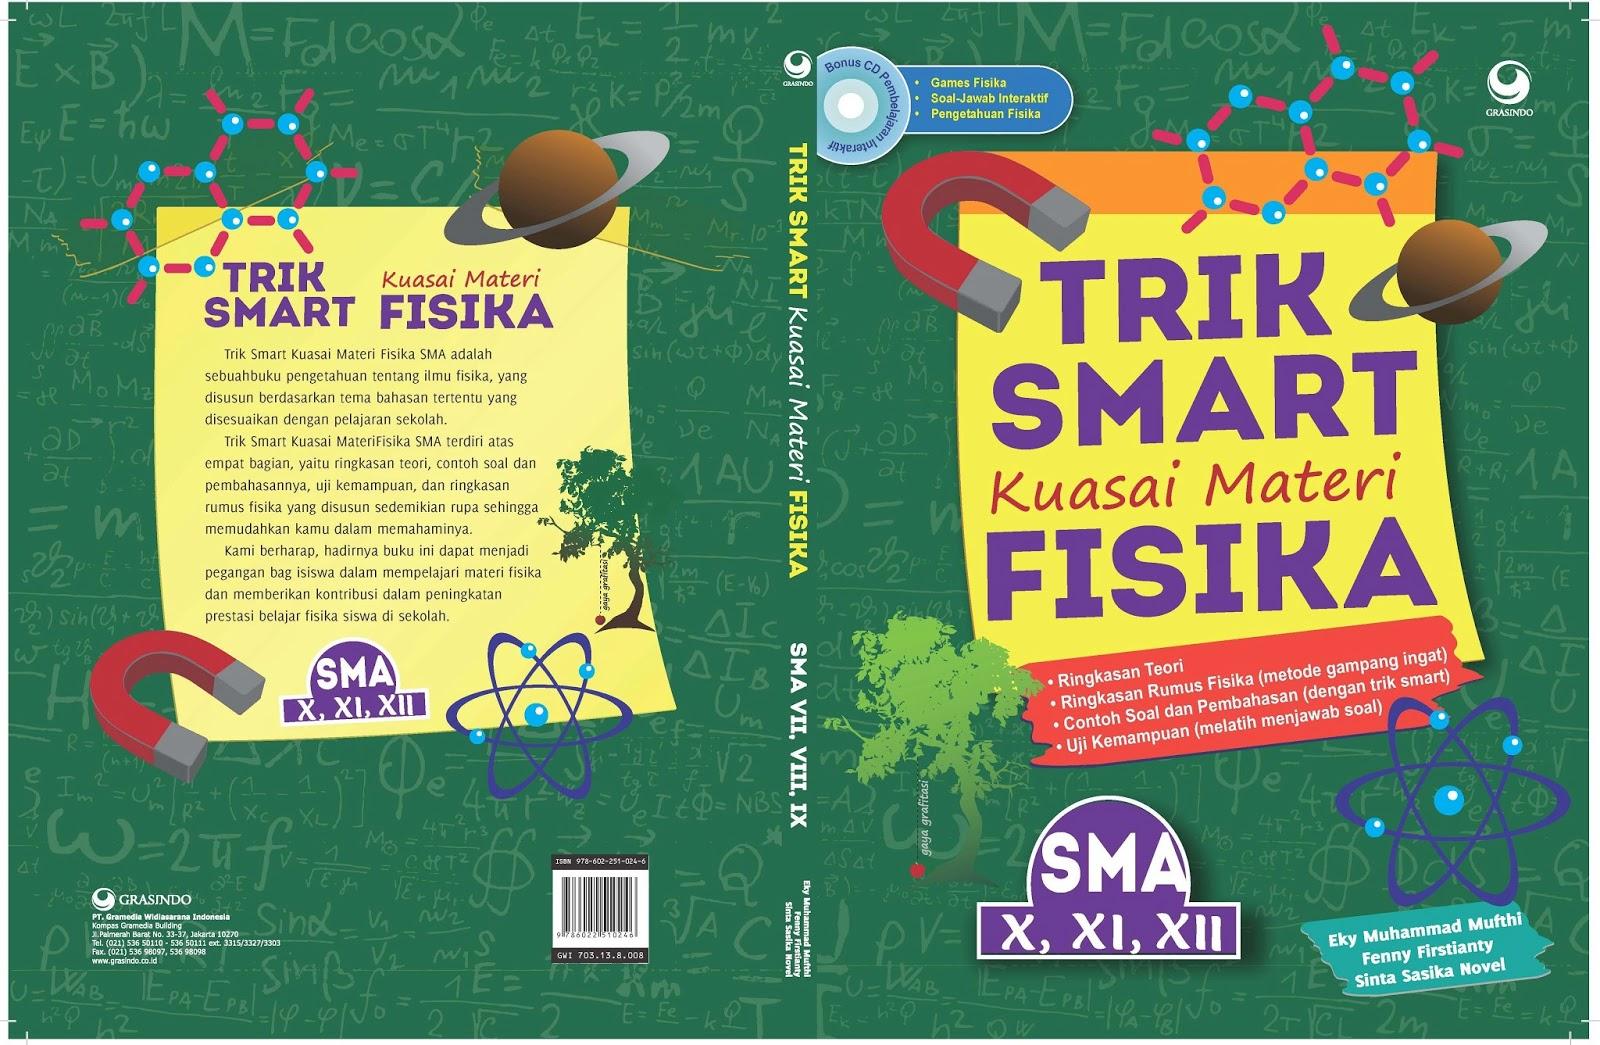 Kumpulan Novel Tentang Pendidikan 2013 4shared Free File Sharing And Storage Login Trik Smart Kuasai Materi Fisika Sma Buku And Novel Karya Sienta